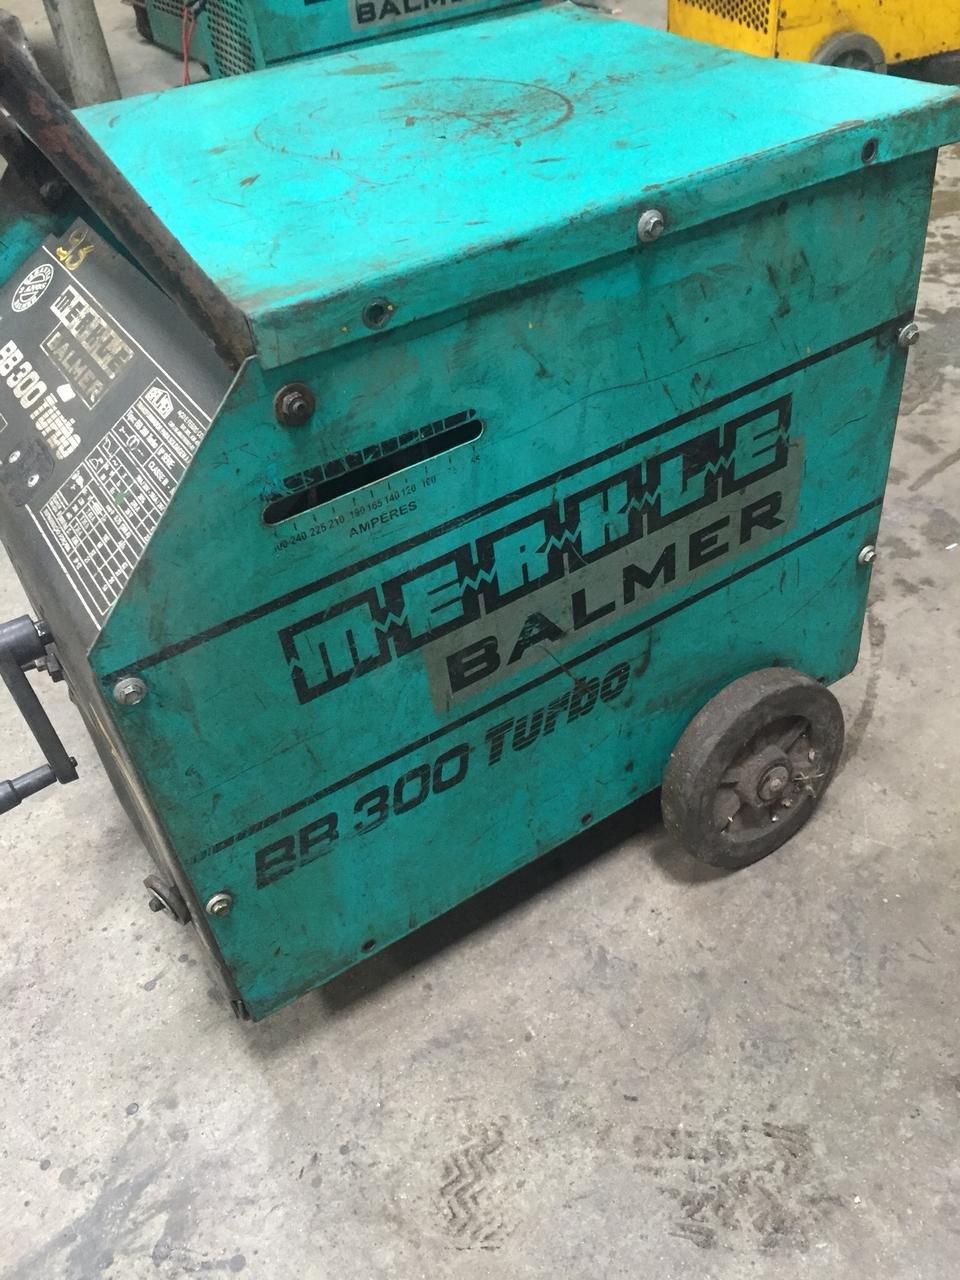 Balmer BB 300 turbo